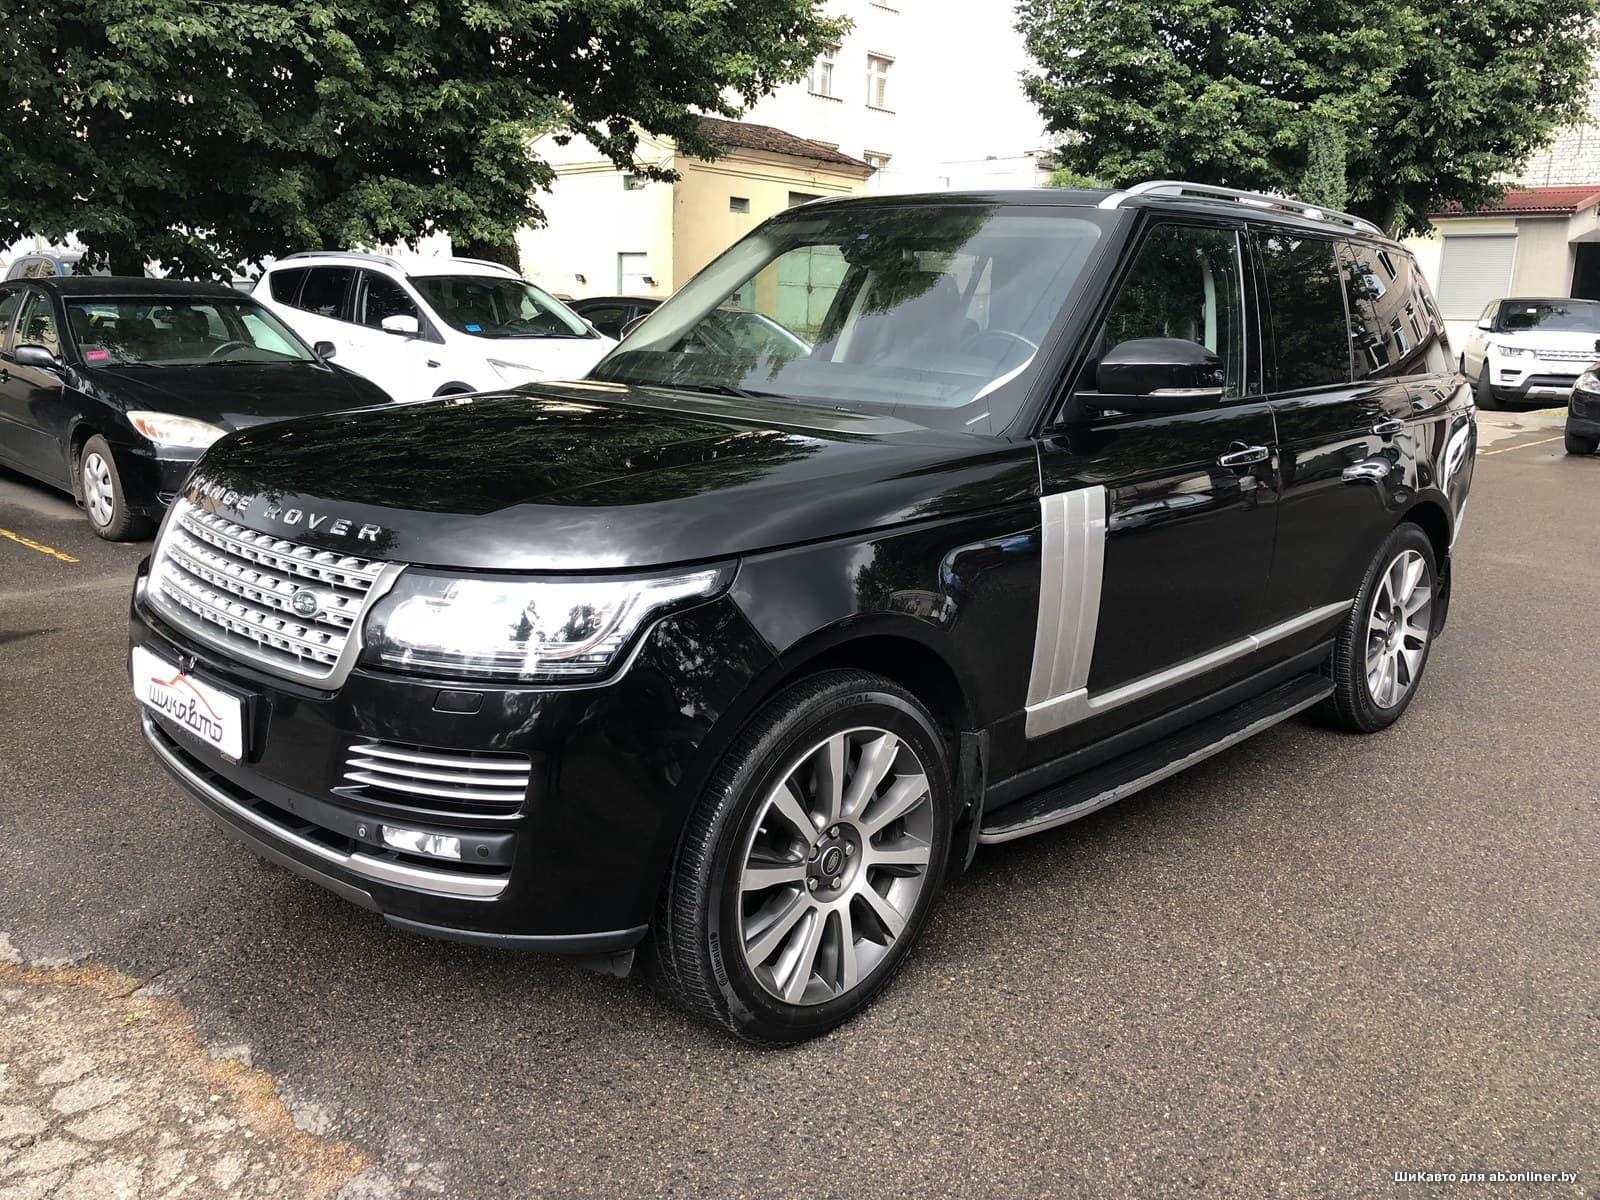 Land Rover Range Rover Vogue SE 4.4D